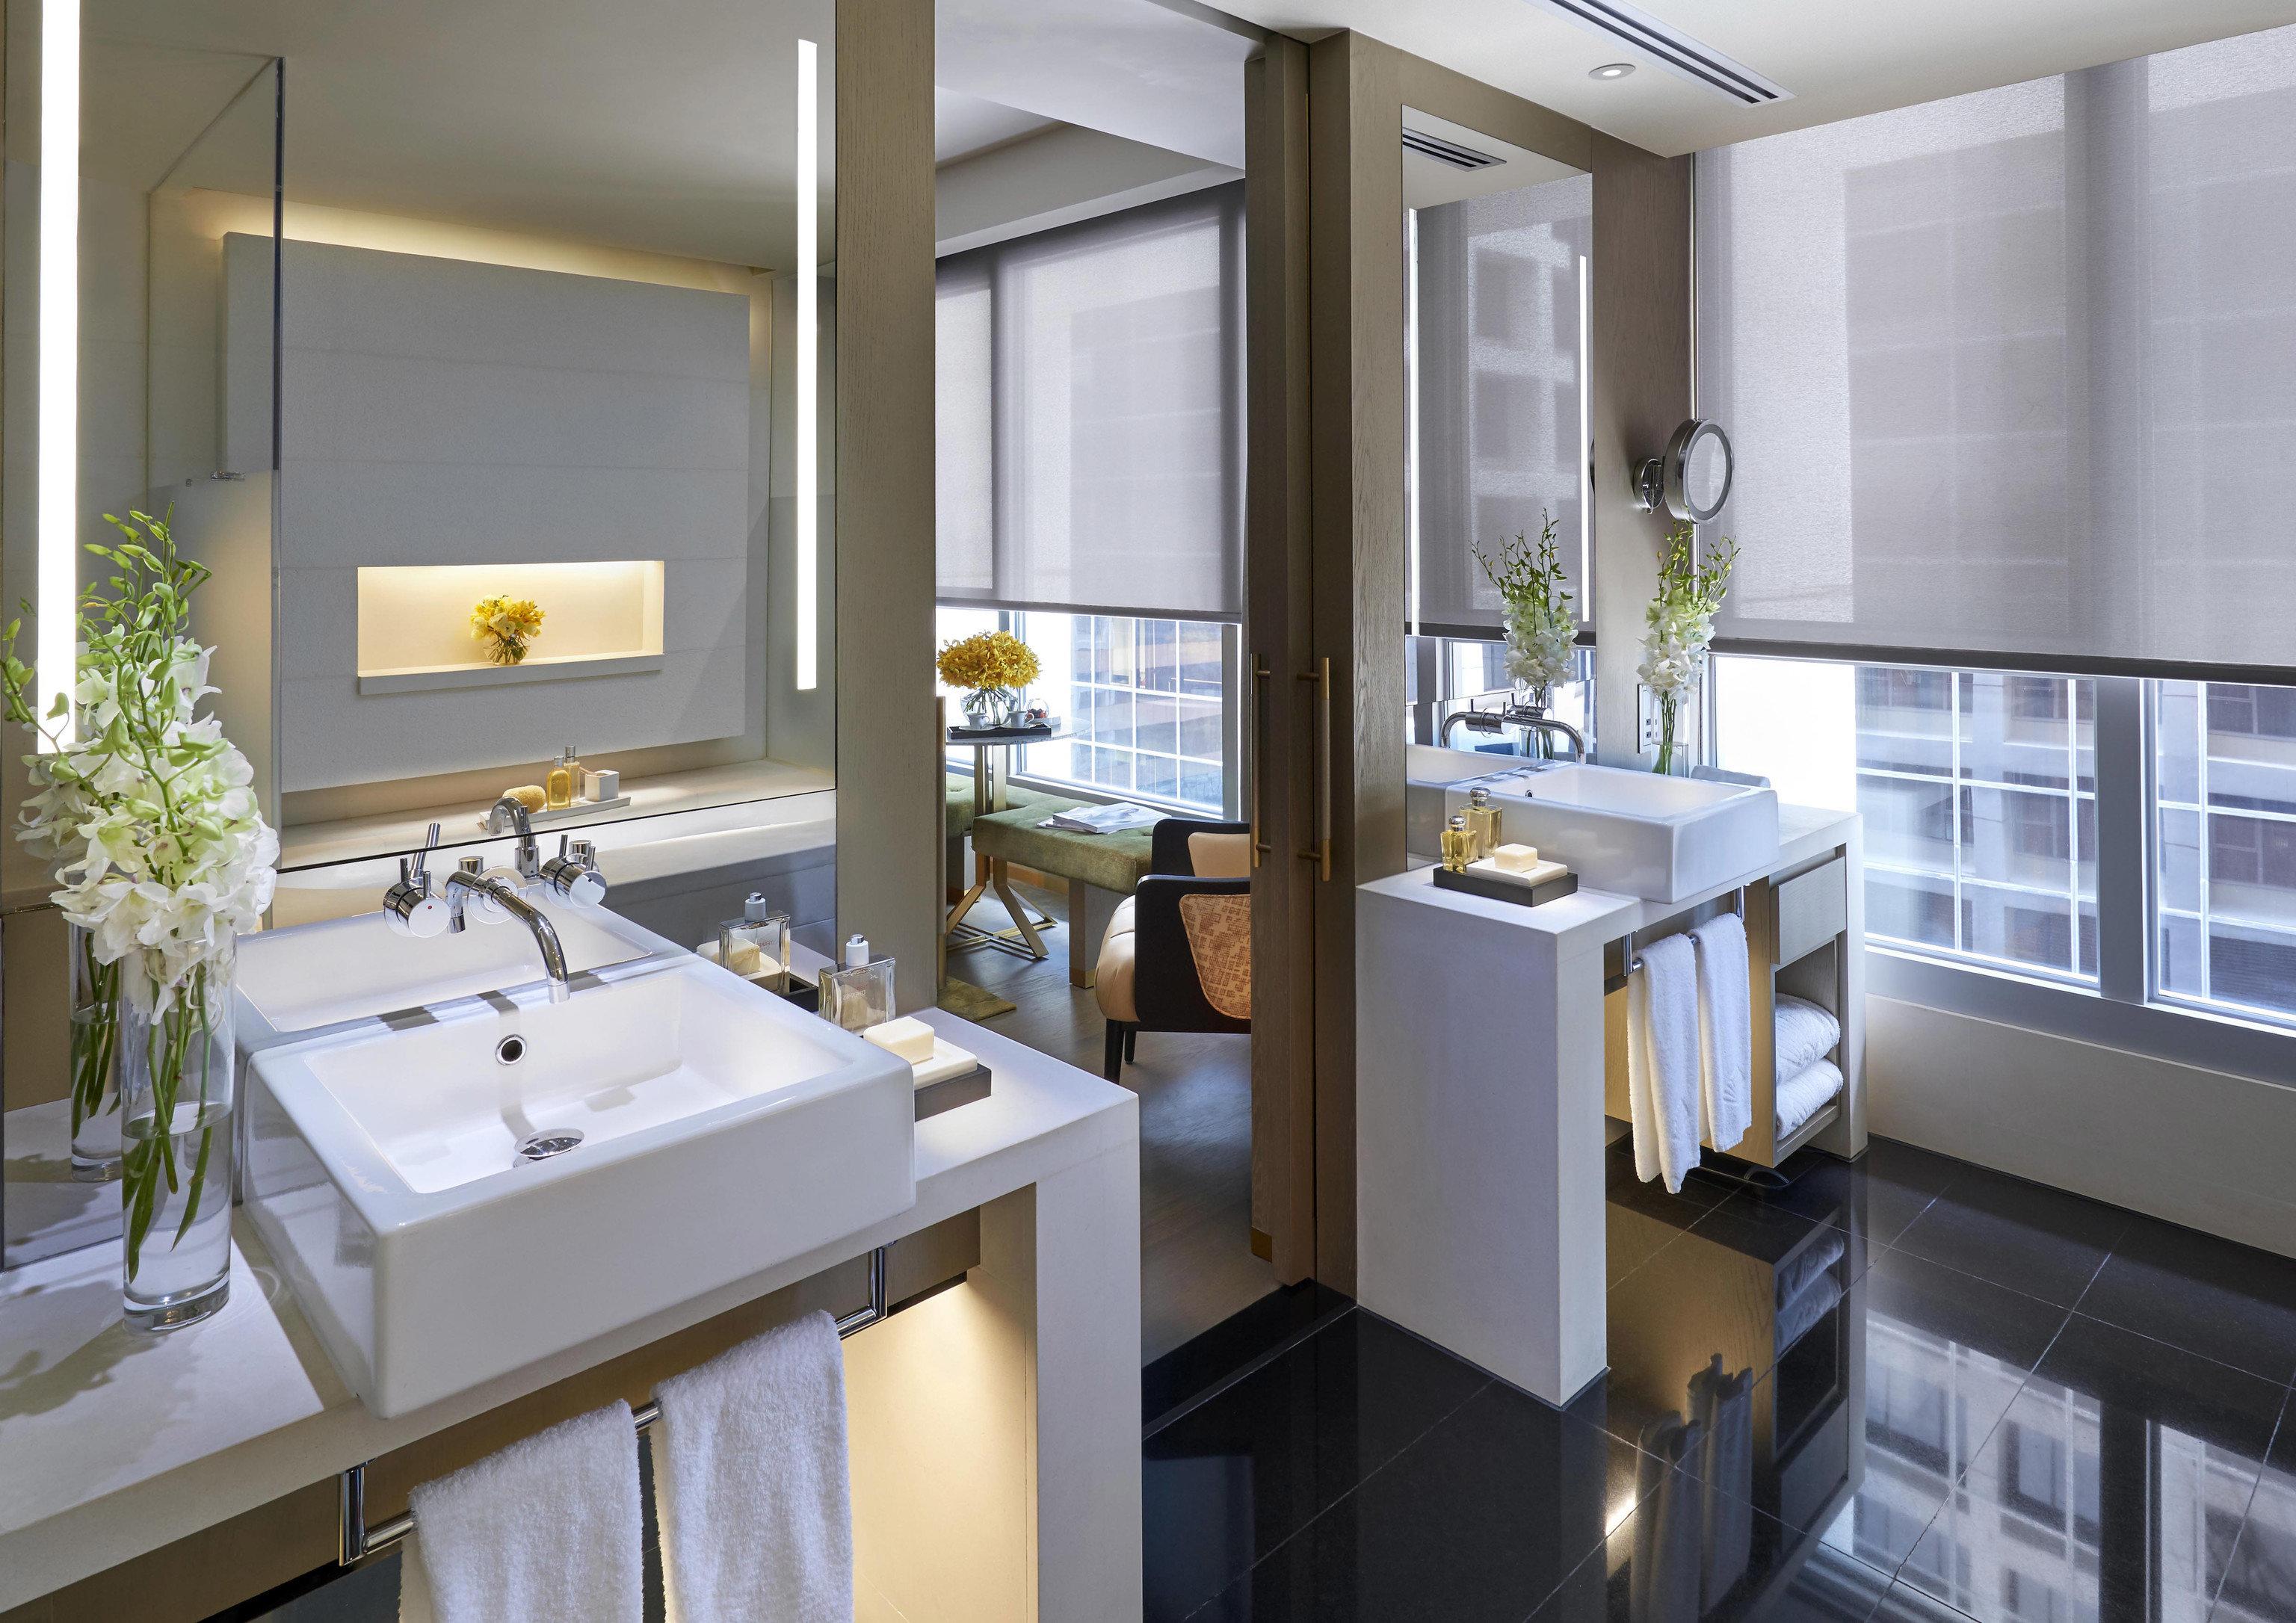 bathroom property sink Kitchen home condominium lighting cabinetry Suite